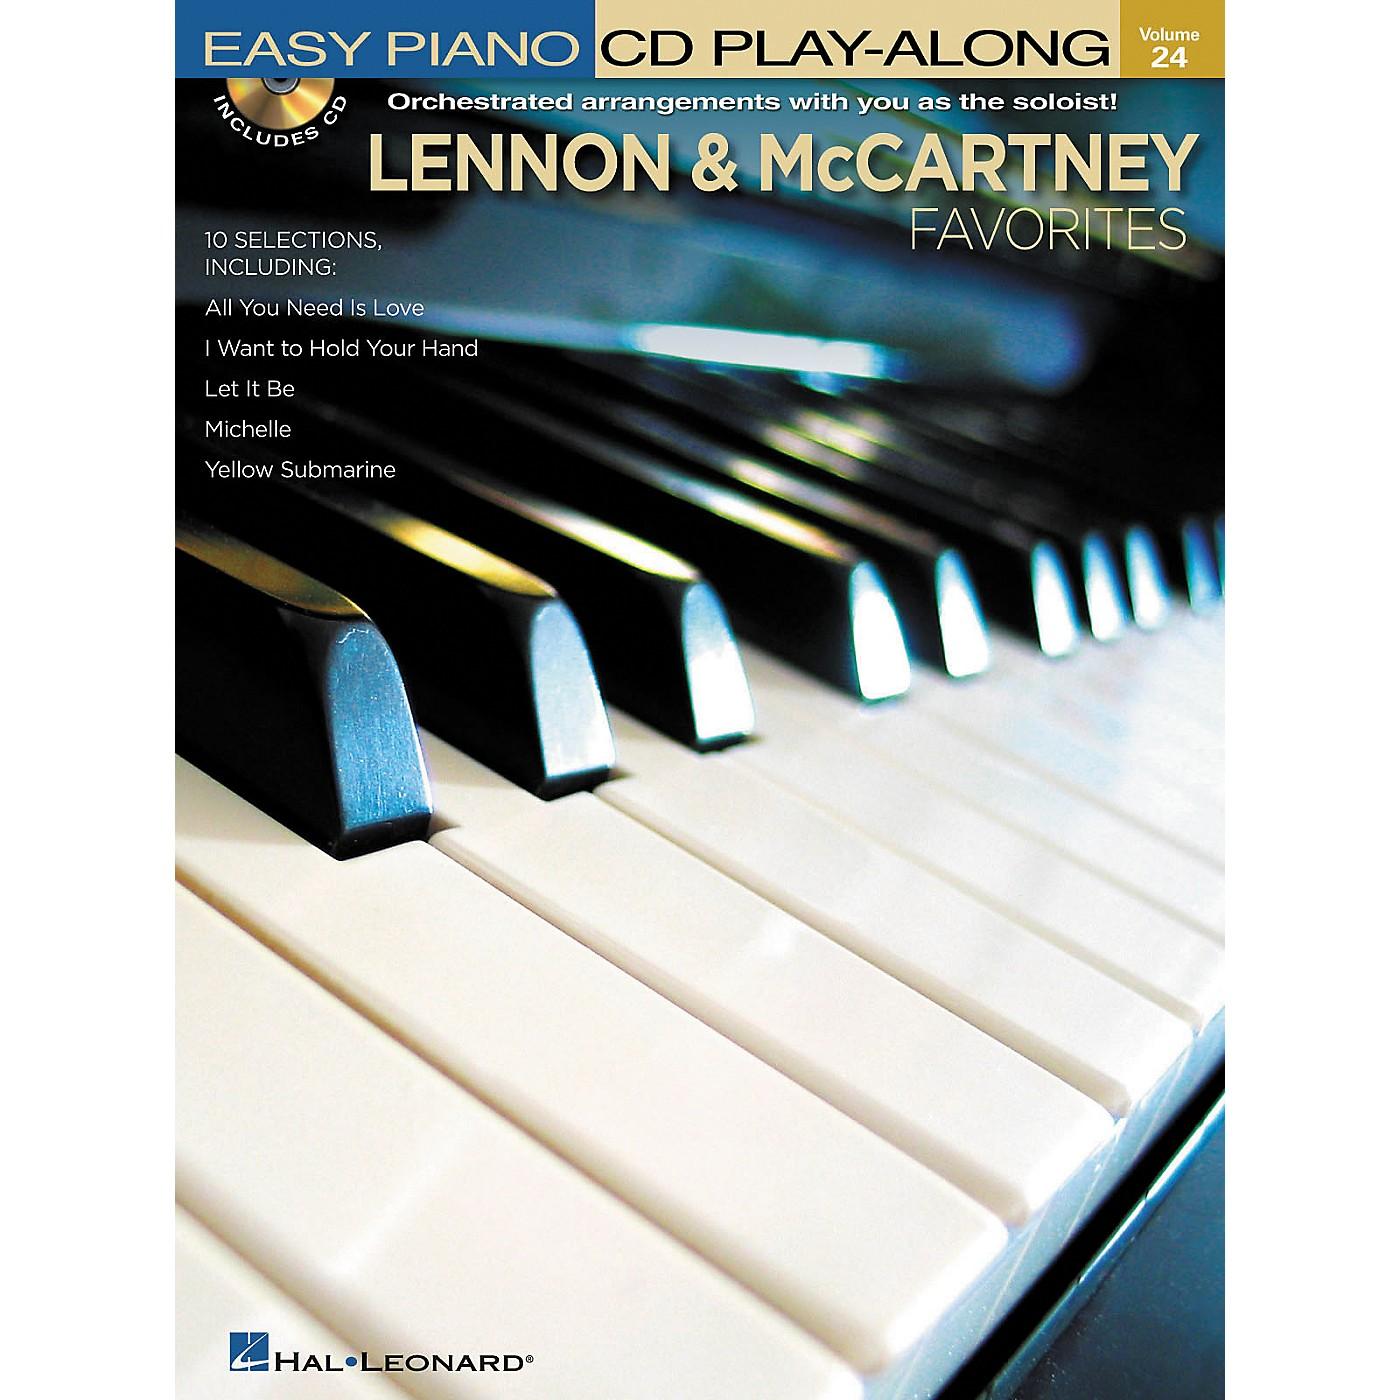 Hal Leonard Lennon & McCartney Favorites - Easy Piano CD Play-Along Volume 24 Book/CD thumbnail